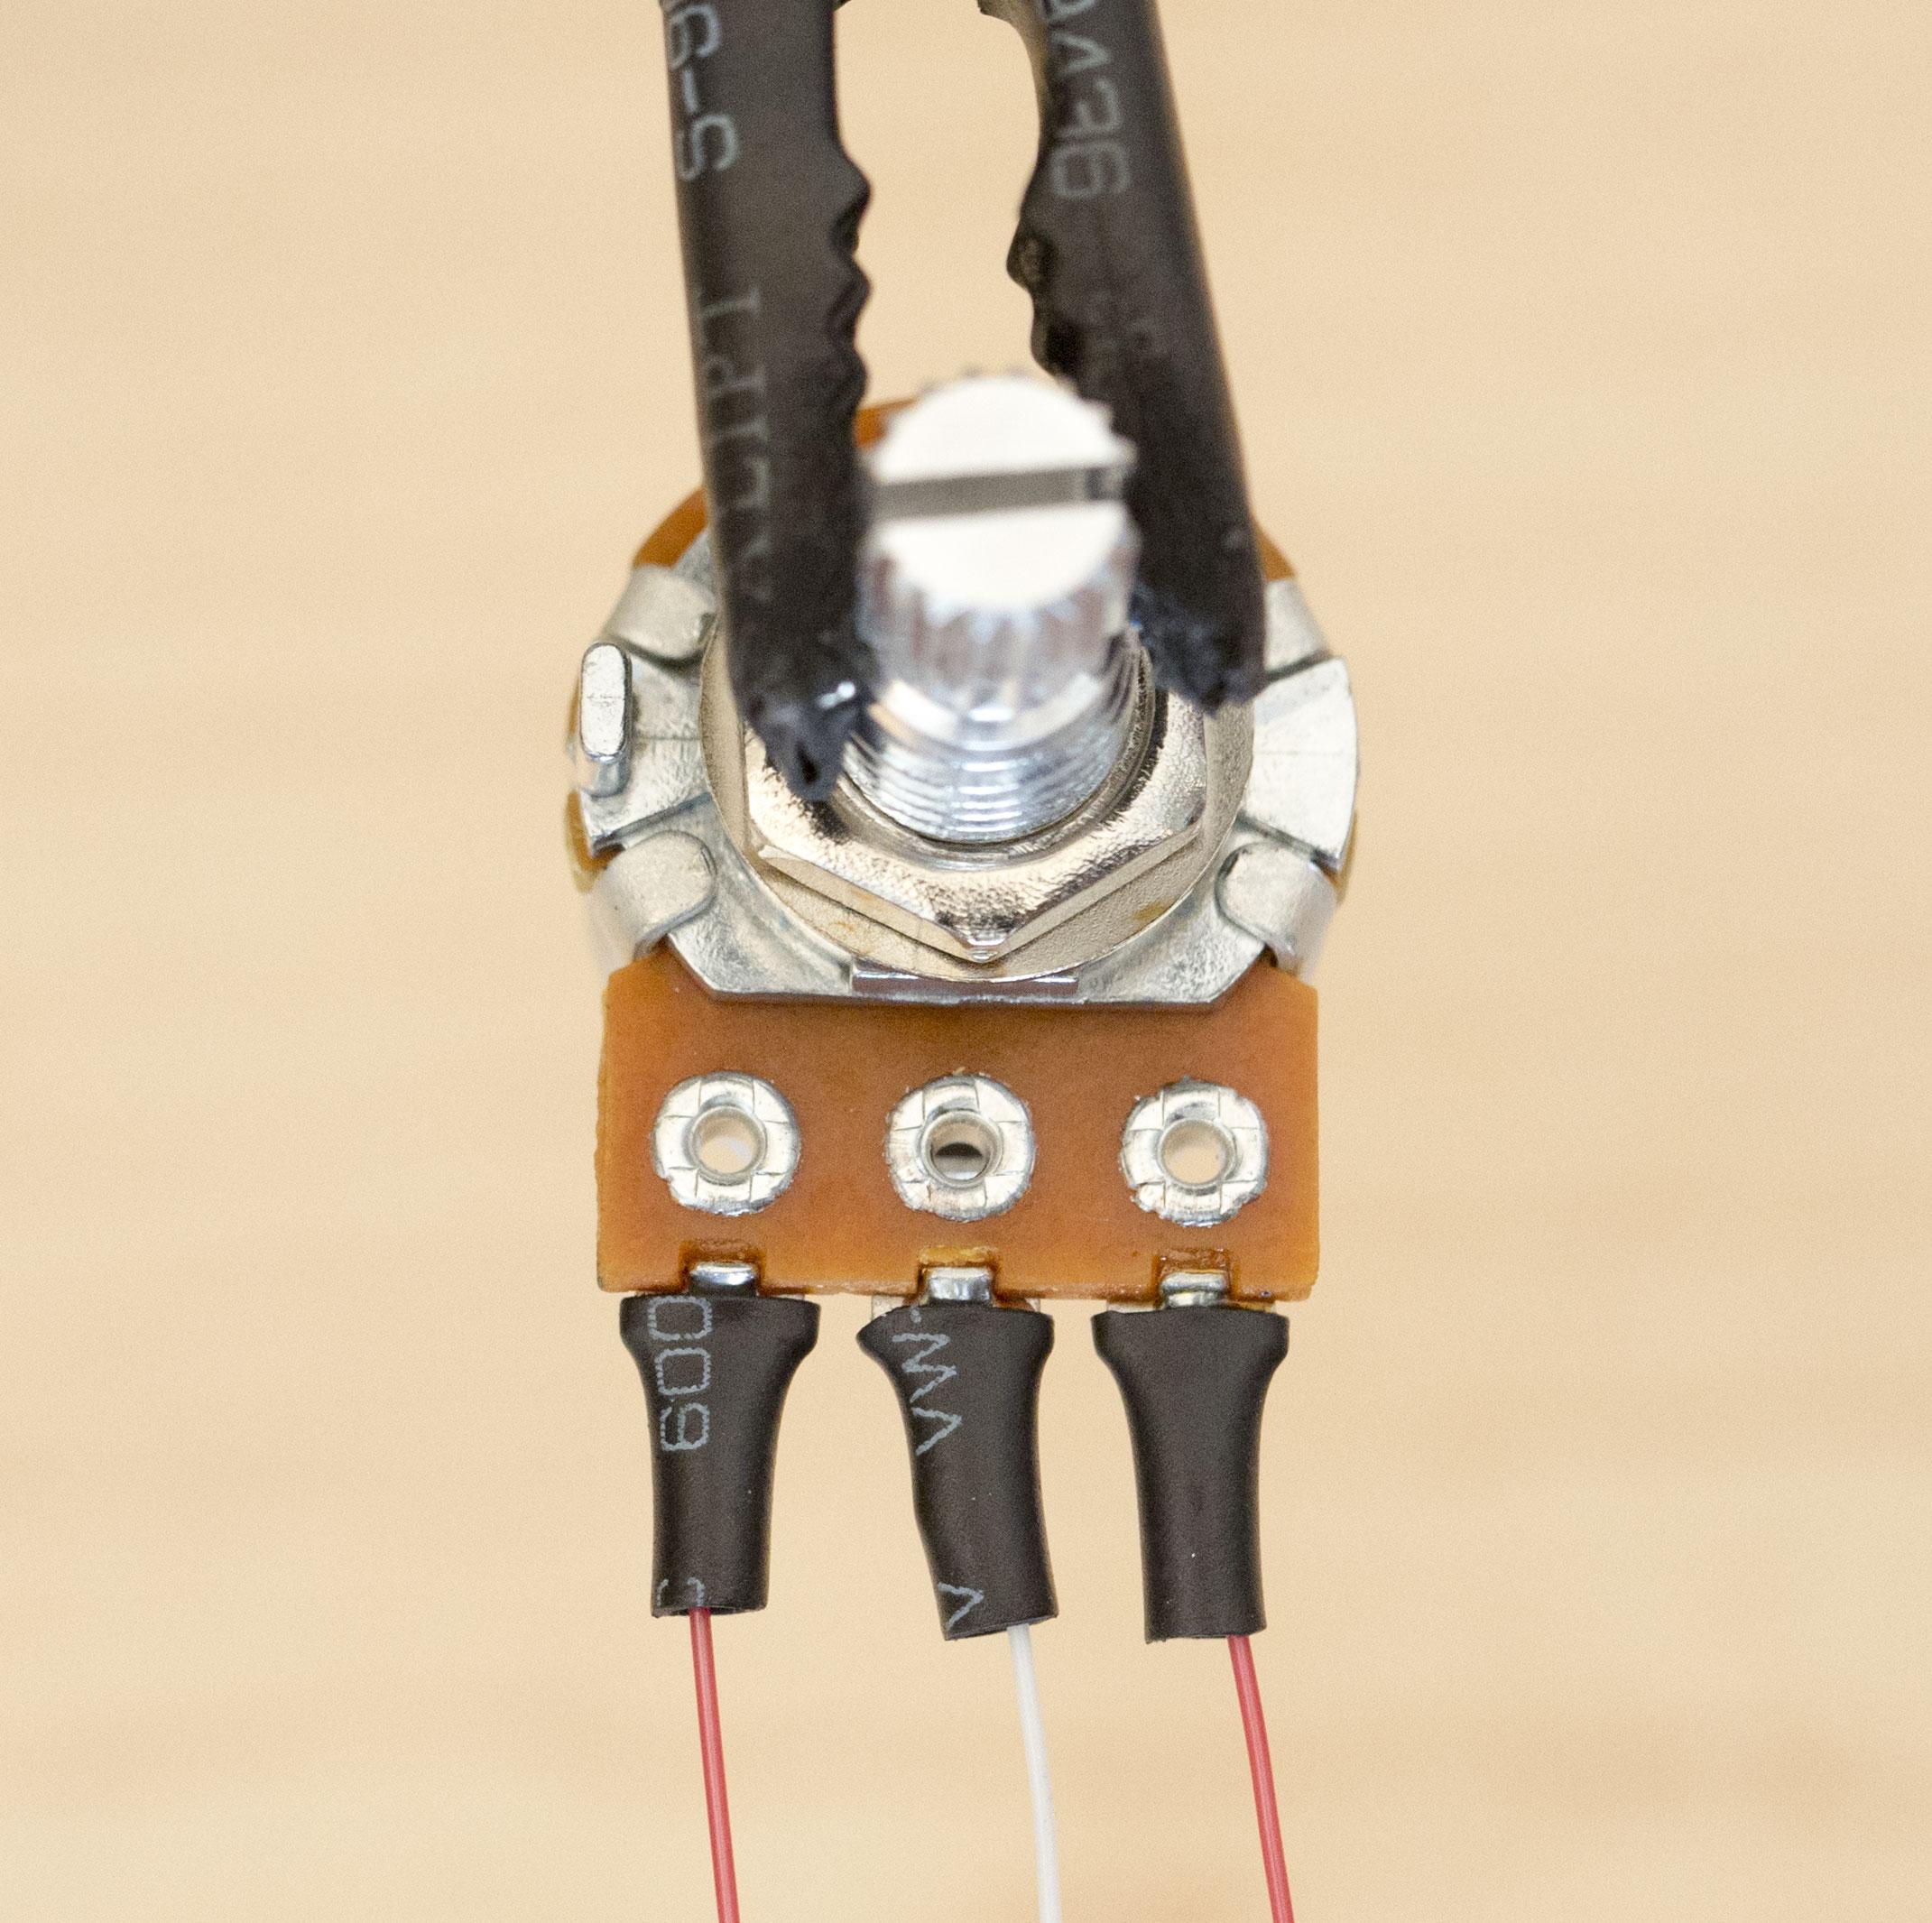 3d_printing_1kpot-wires.jpg